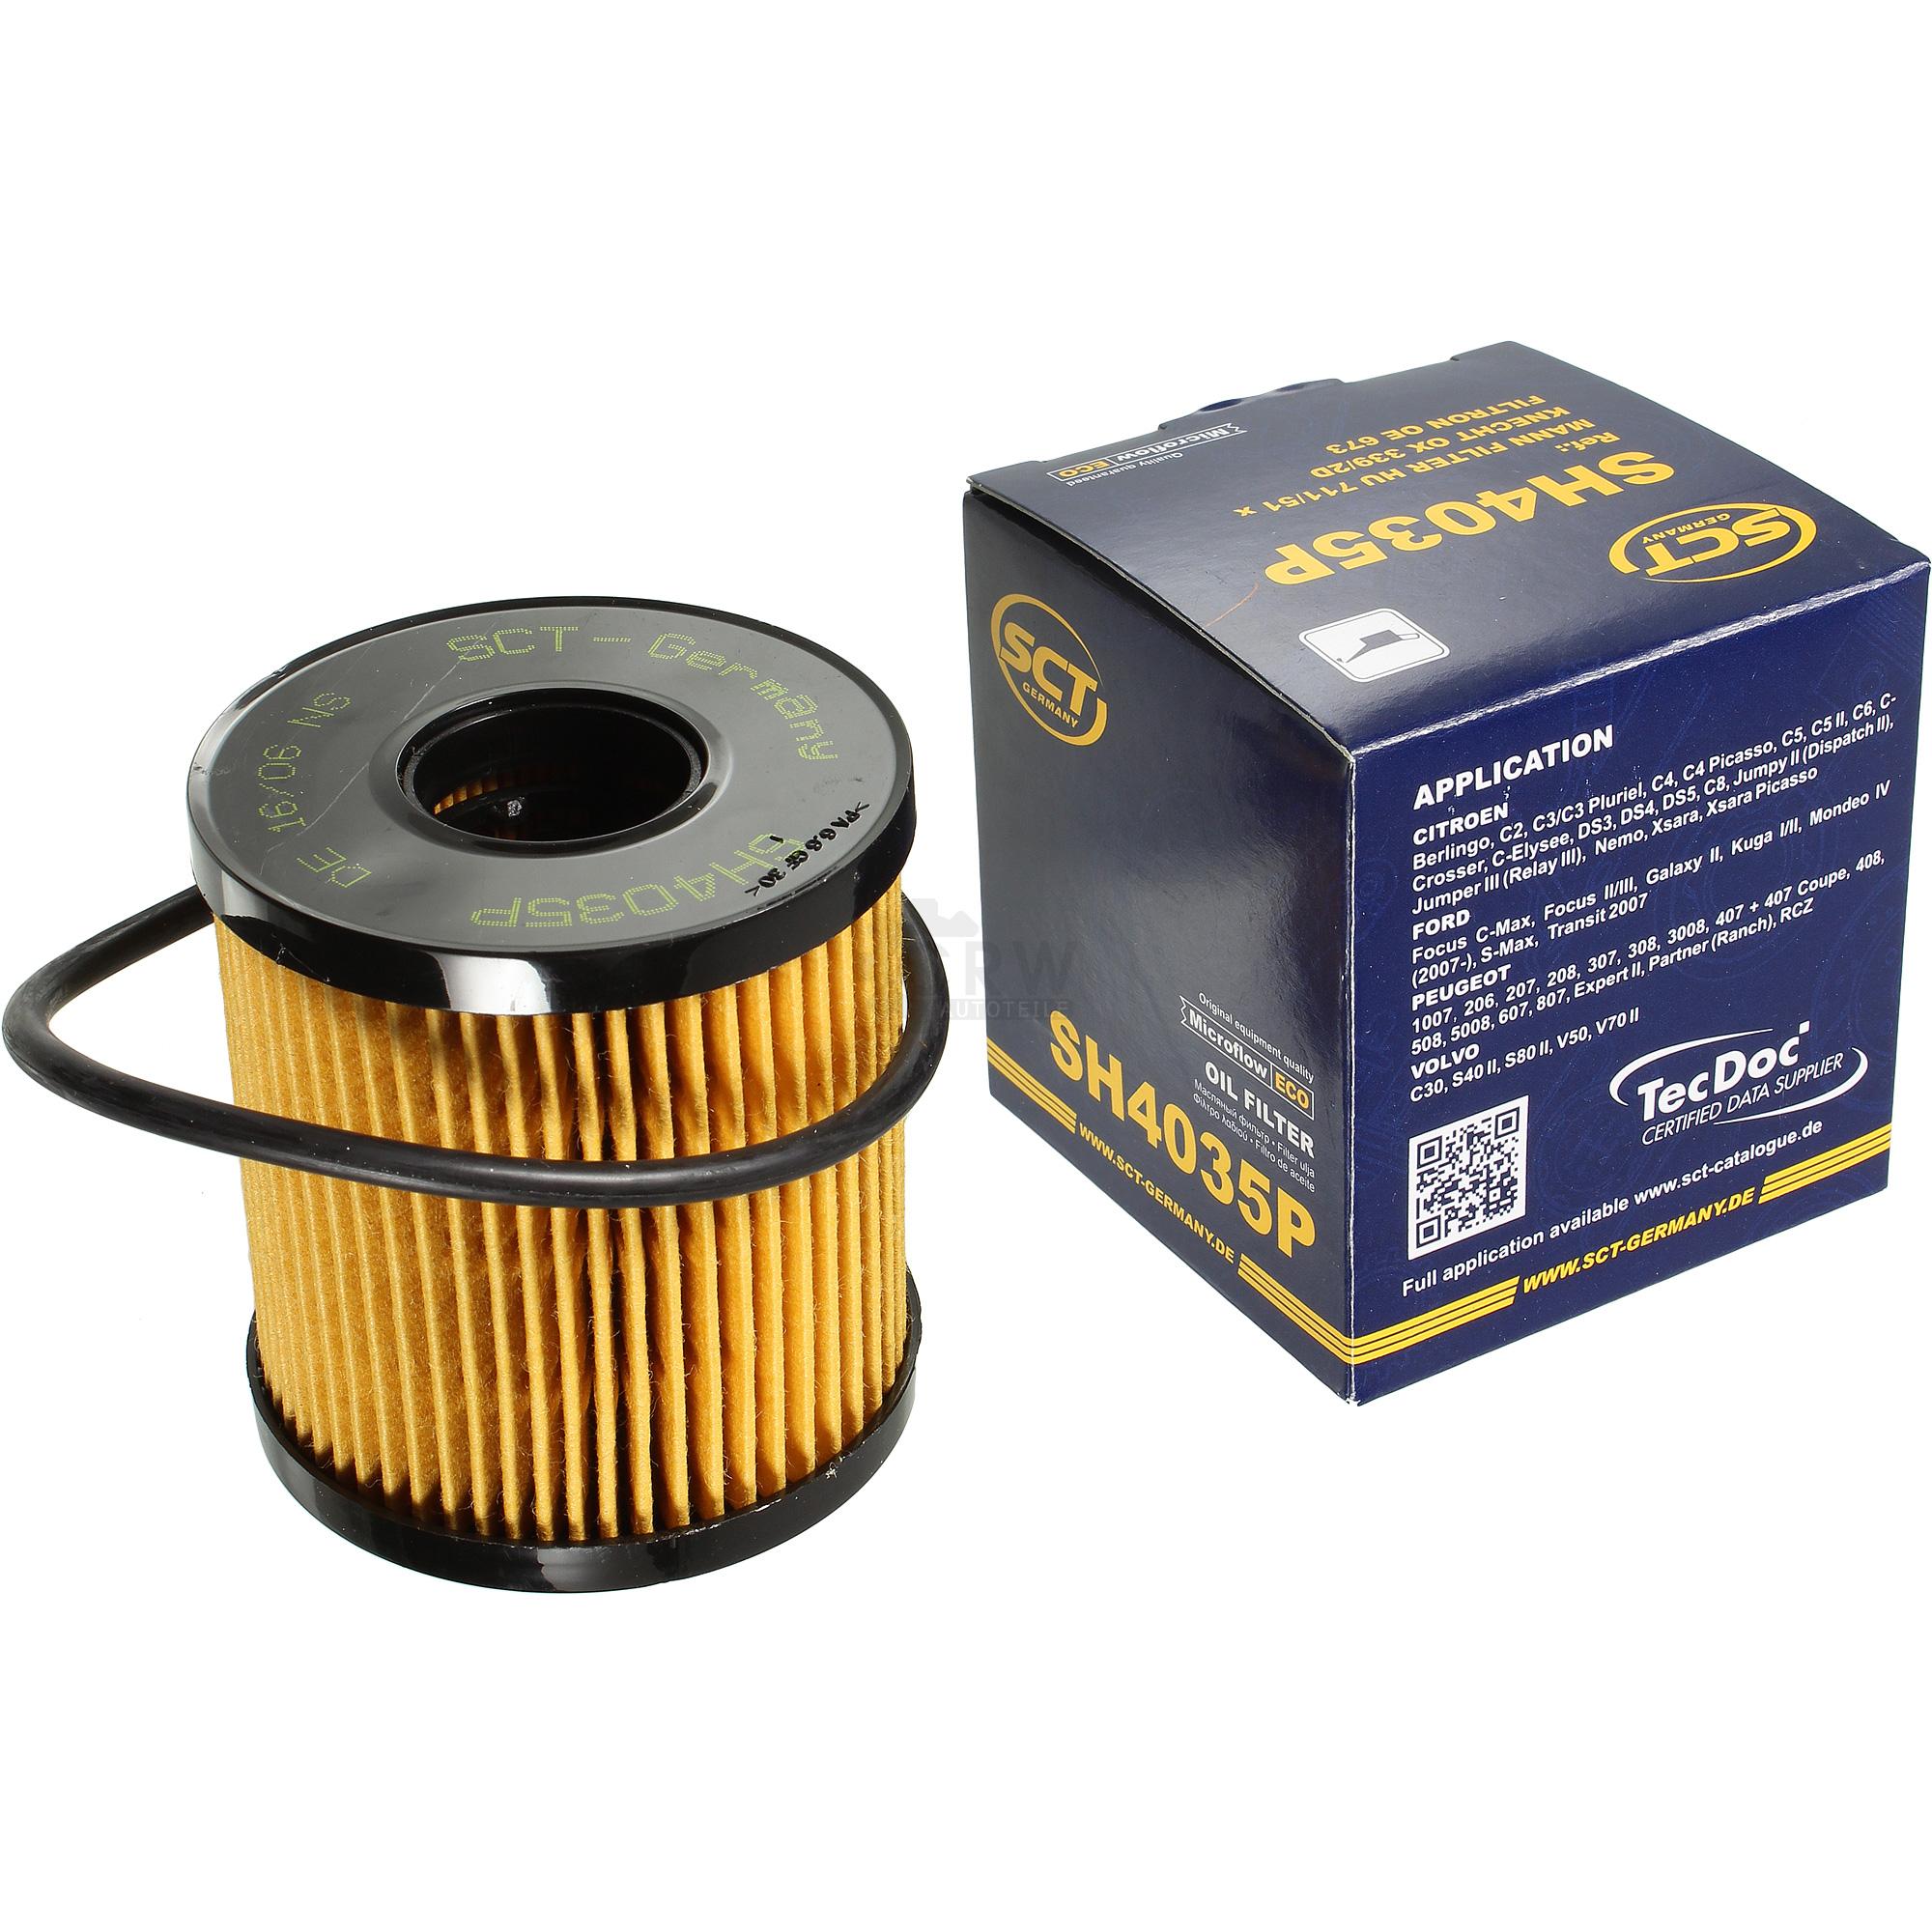 Olwechsel-Set-7L-MANNOL-Extreme-5W-40-Motoroel-SCT-Filter-KIT-10198612 Indexbild 2